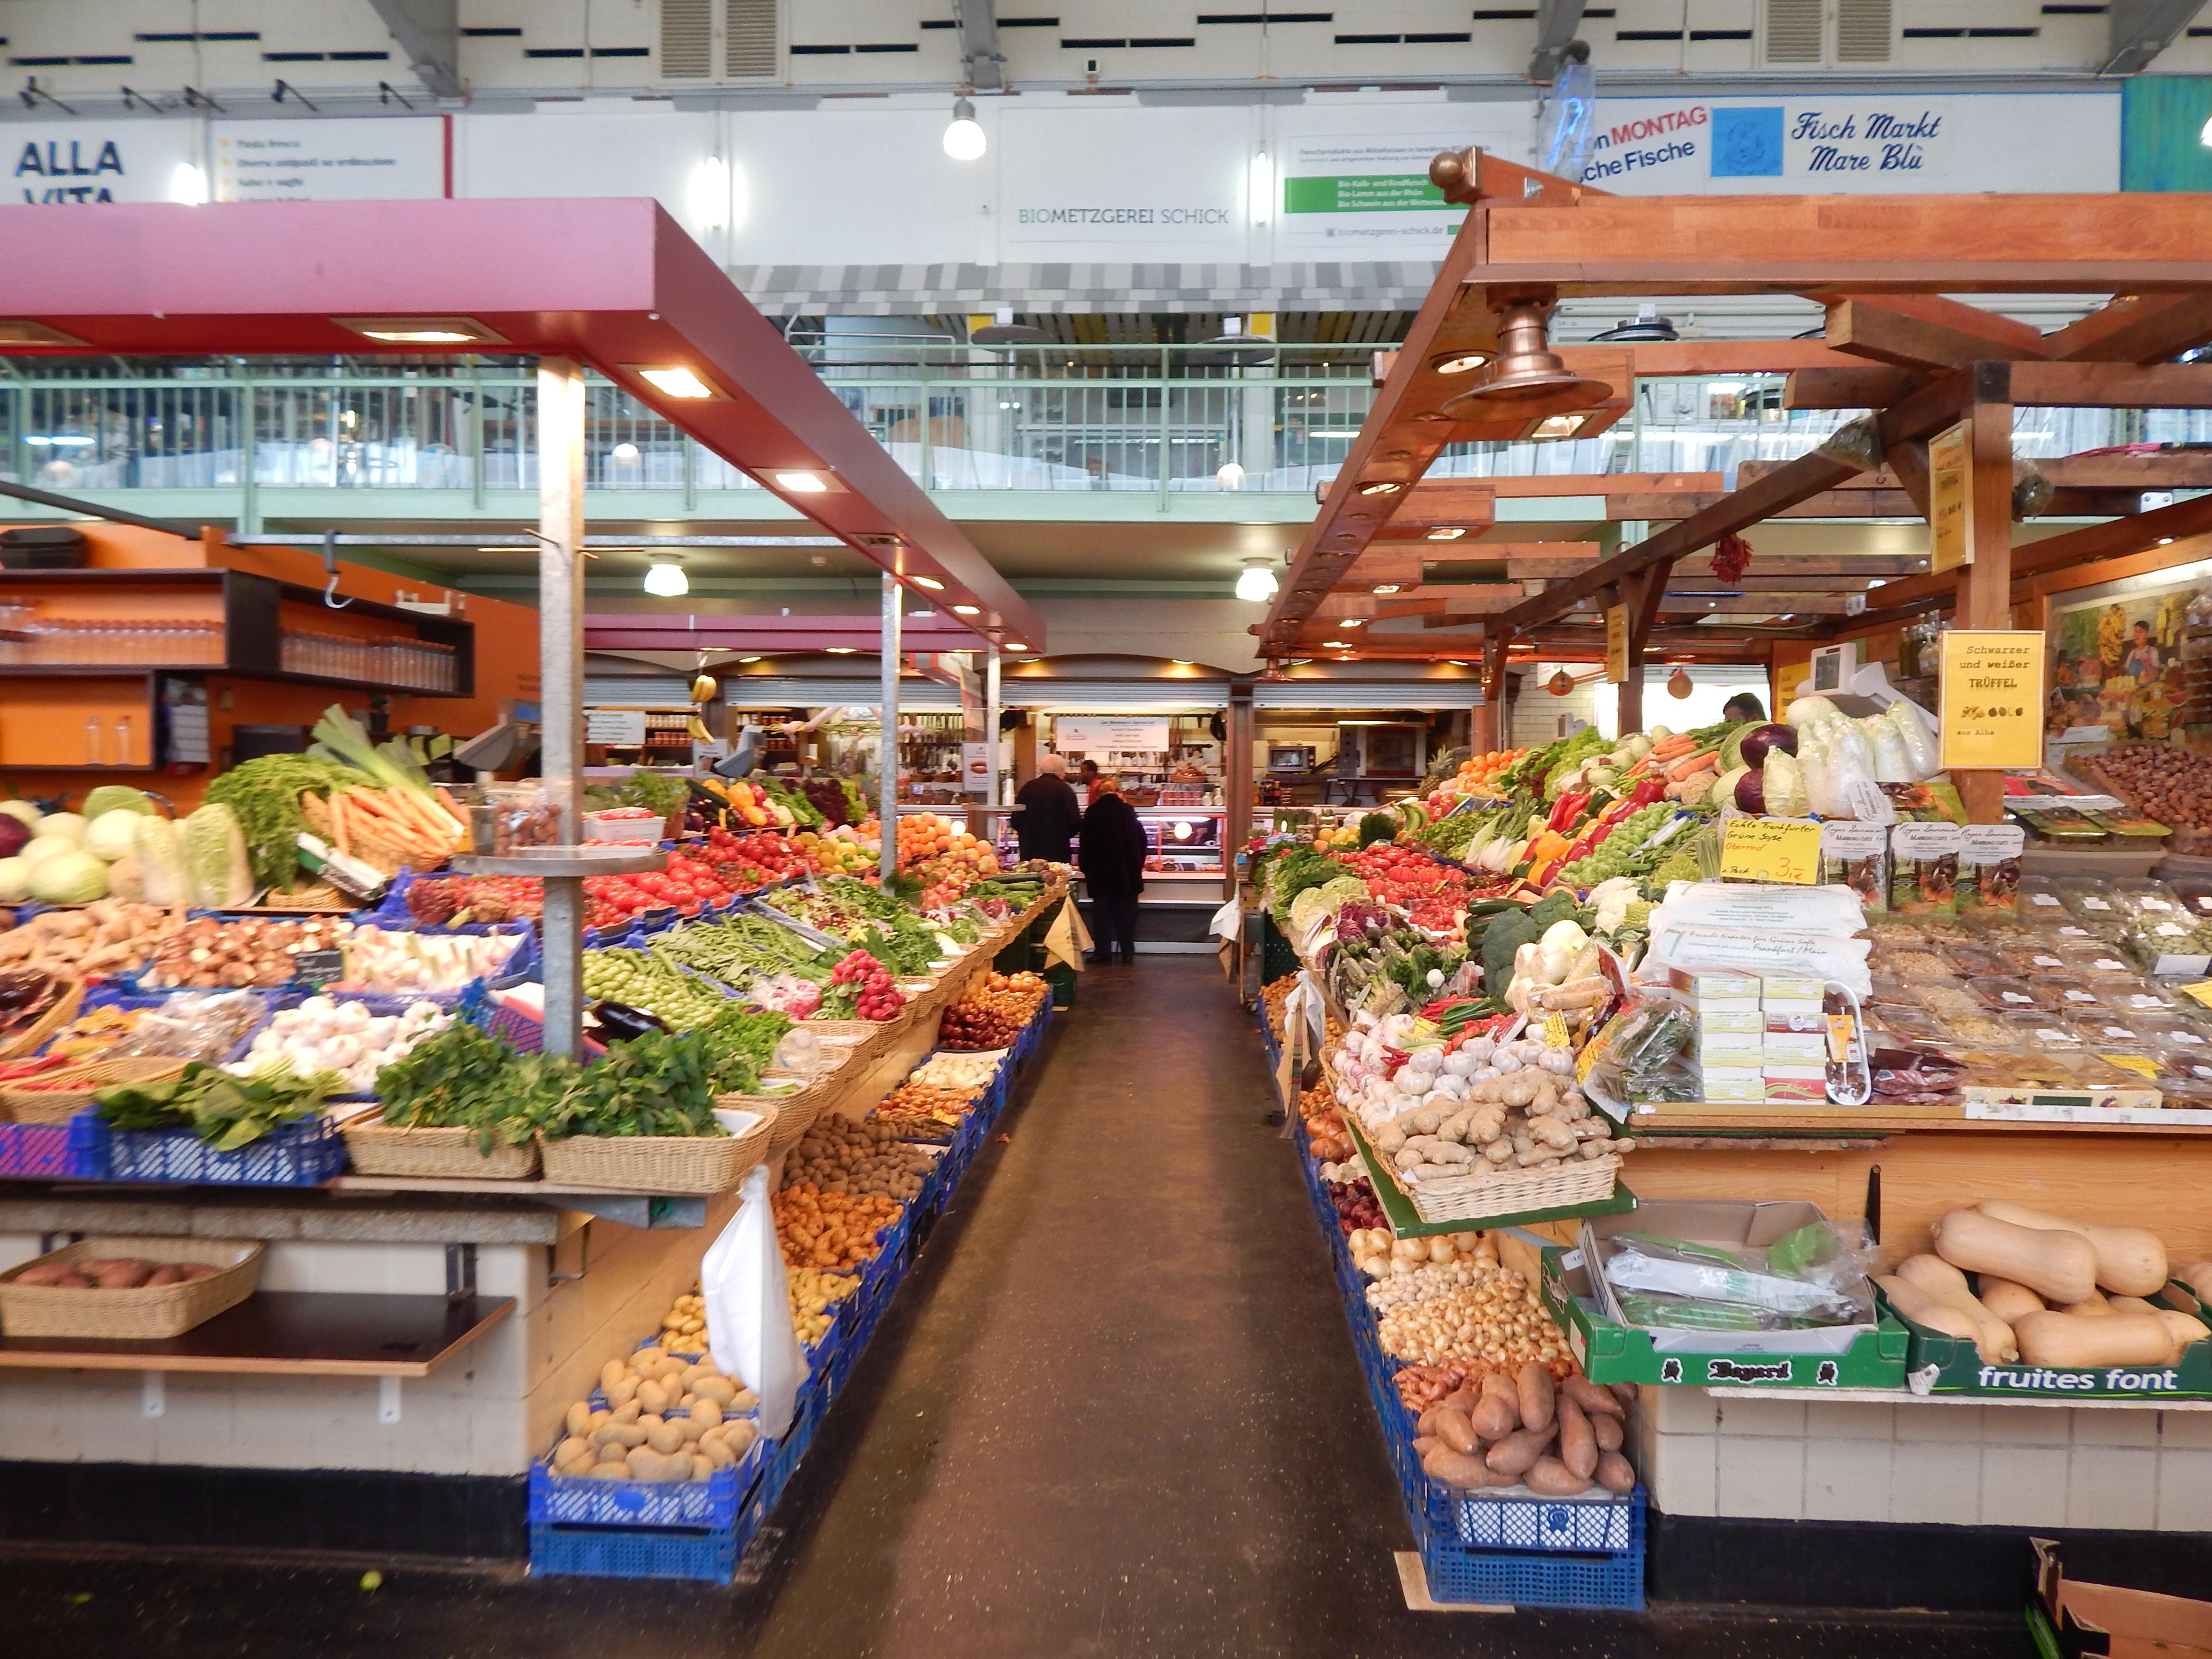 An image of a market in Frankfurt, Germany.